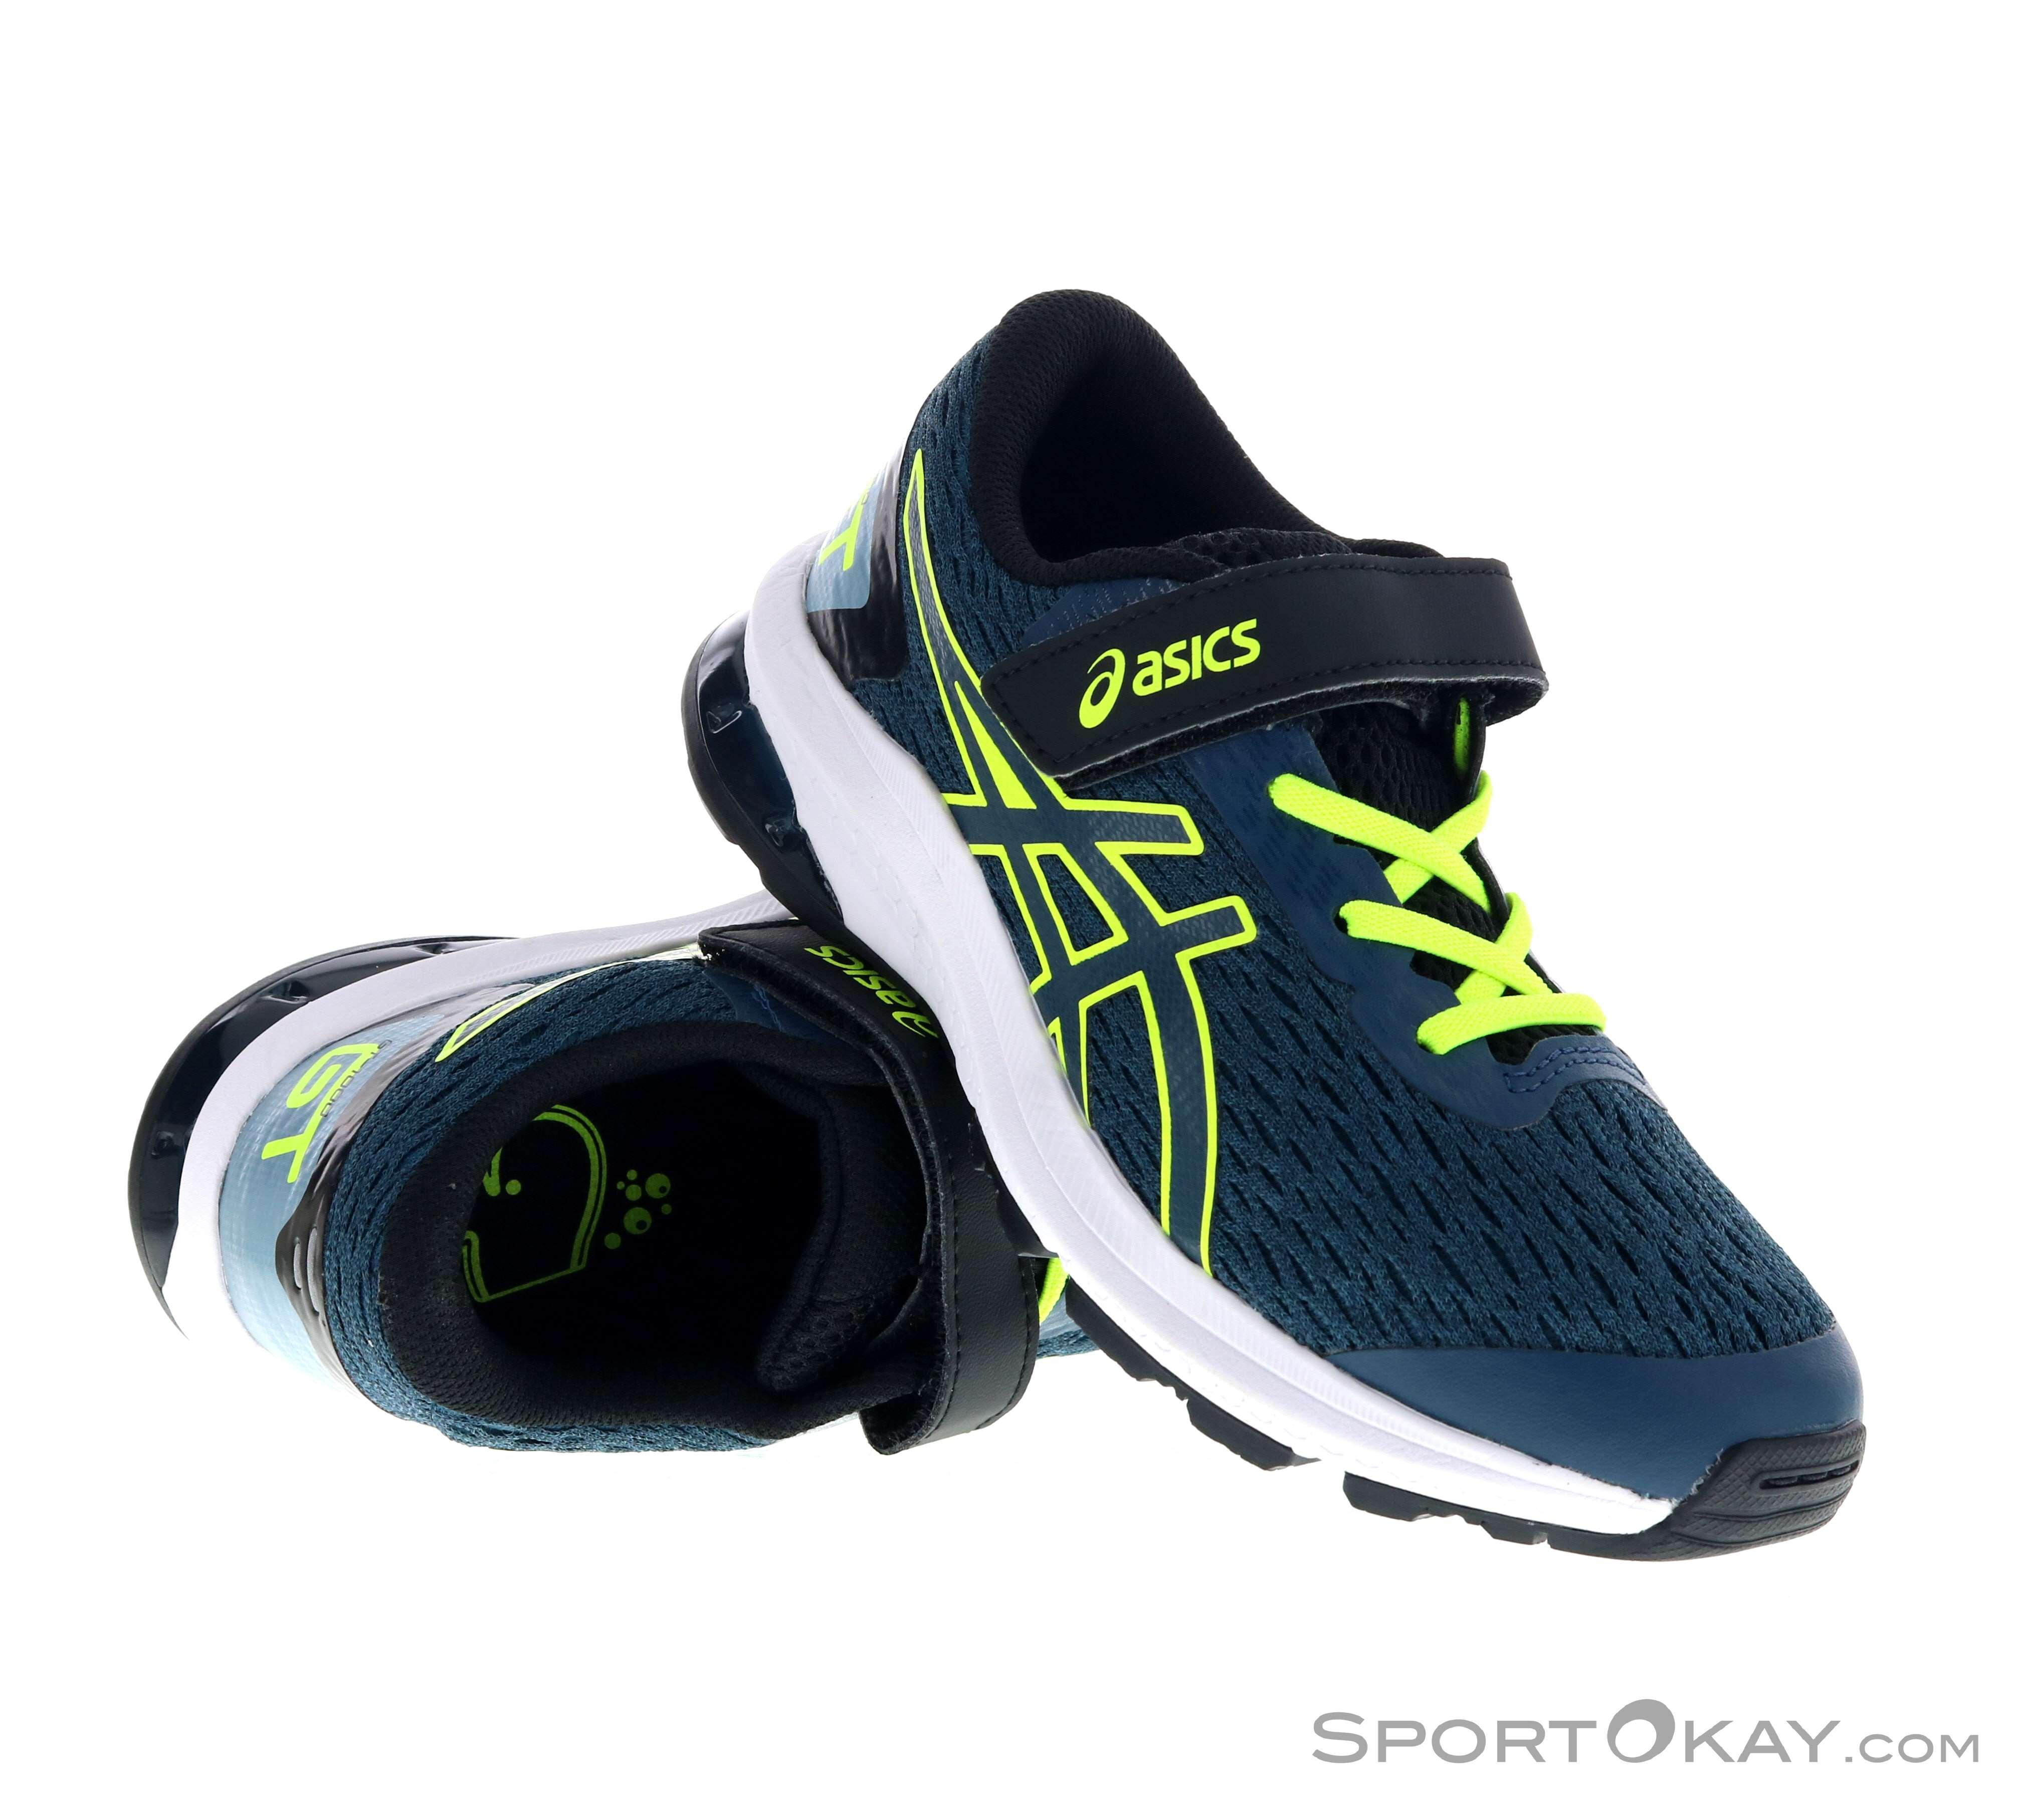 Asics GT-1000 9 PS Kids Running Shoes